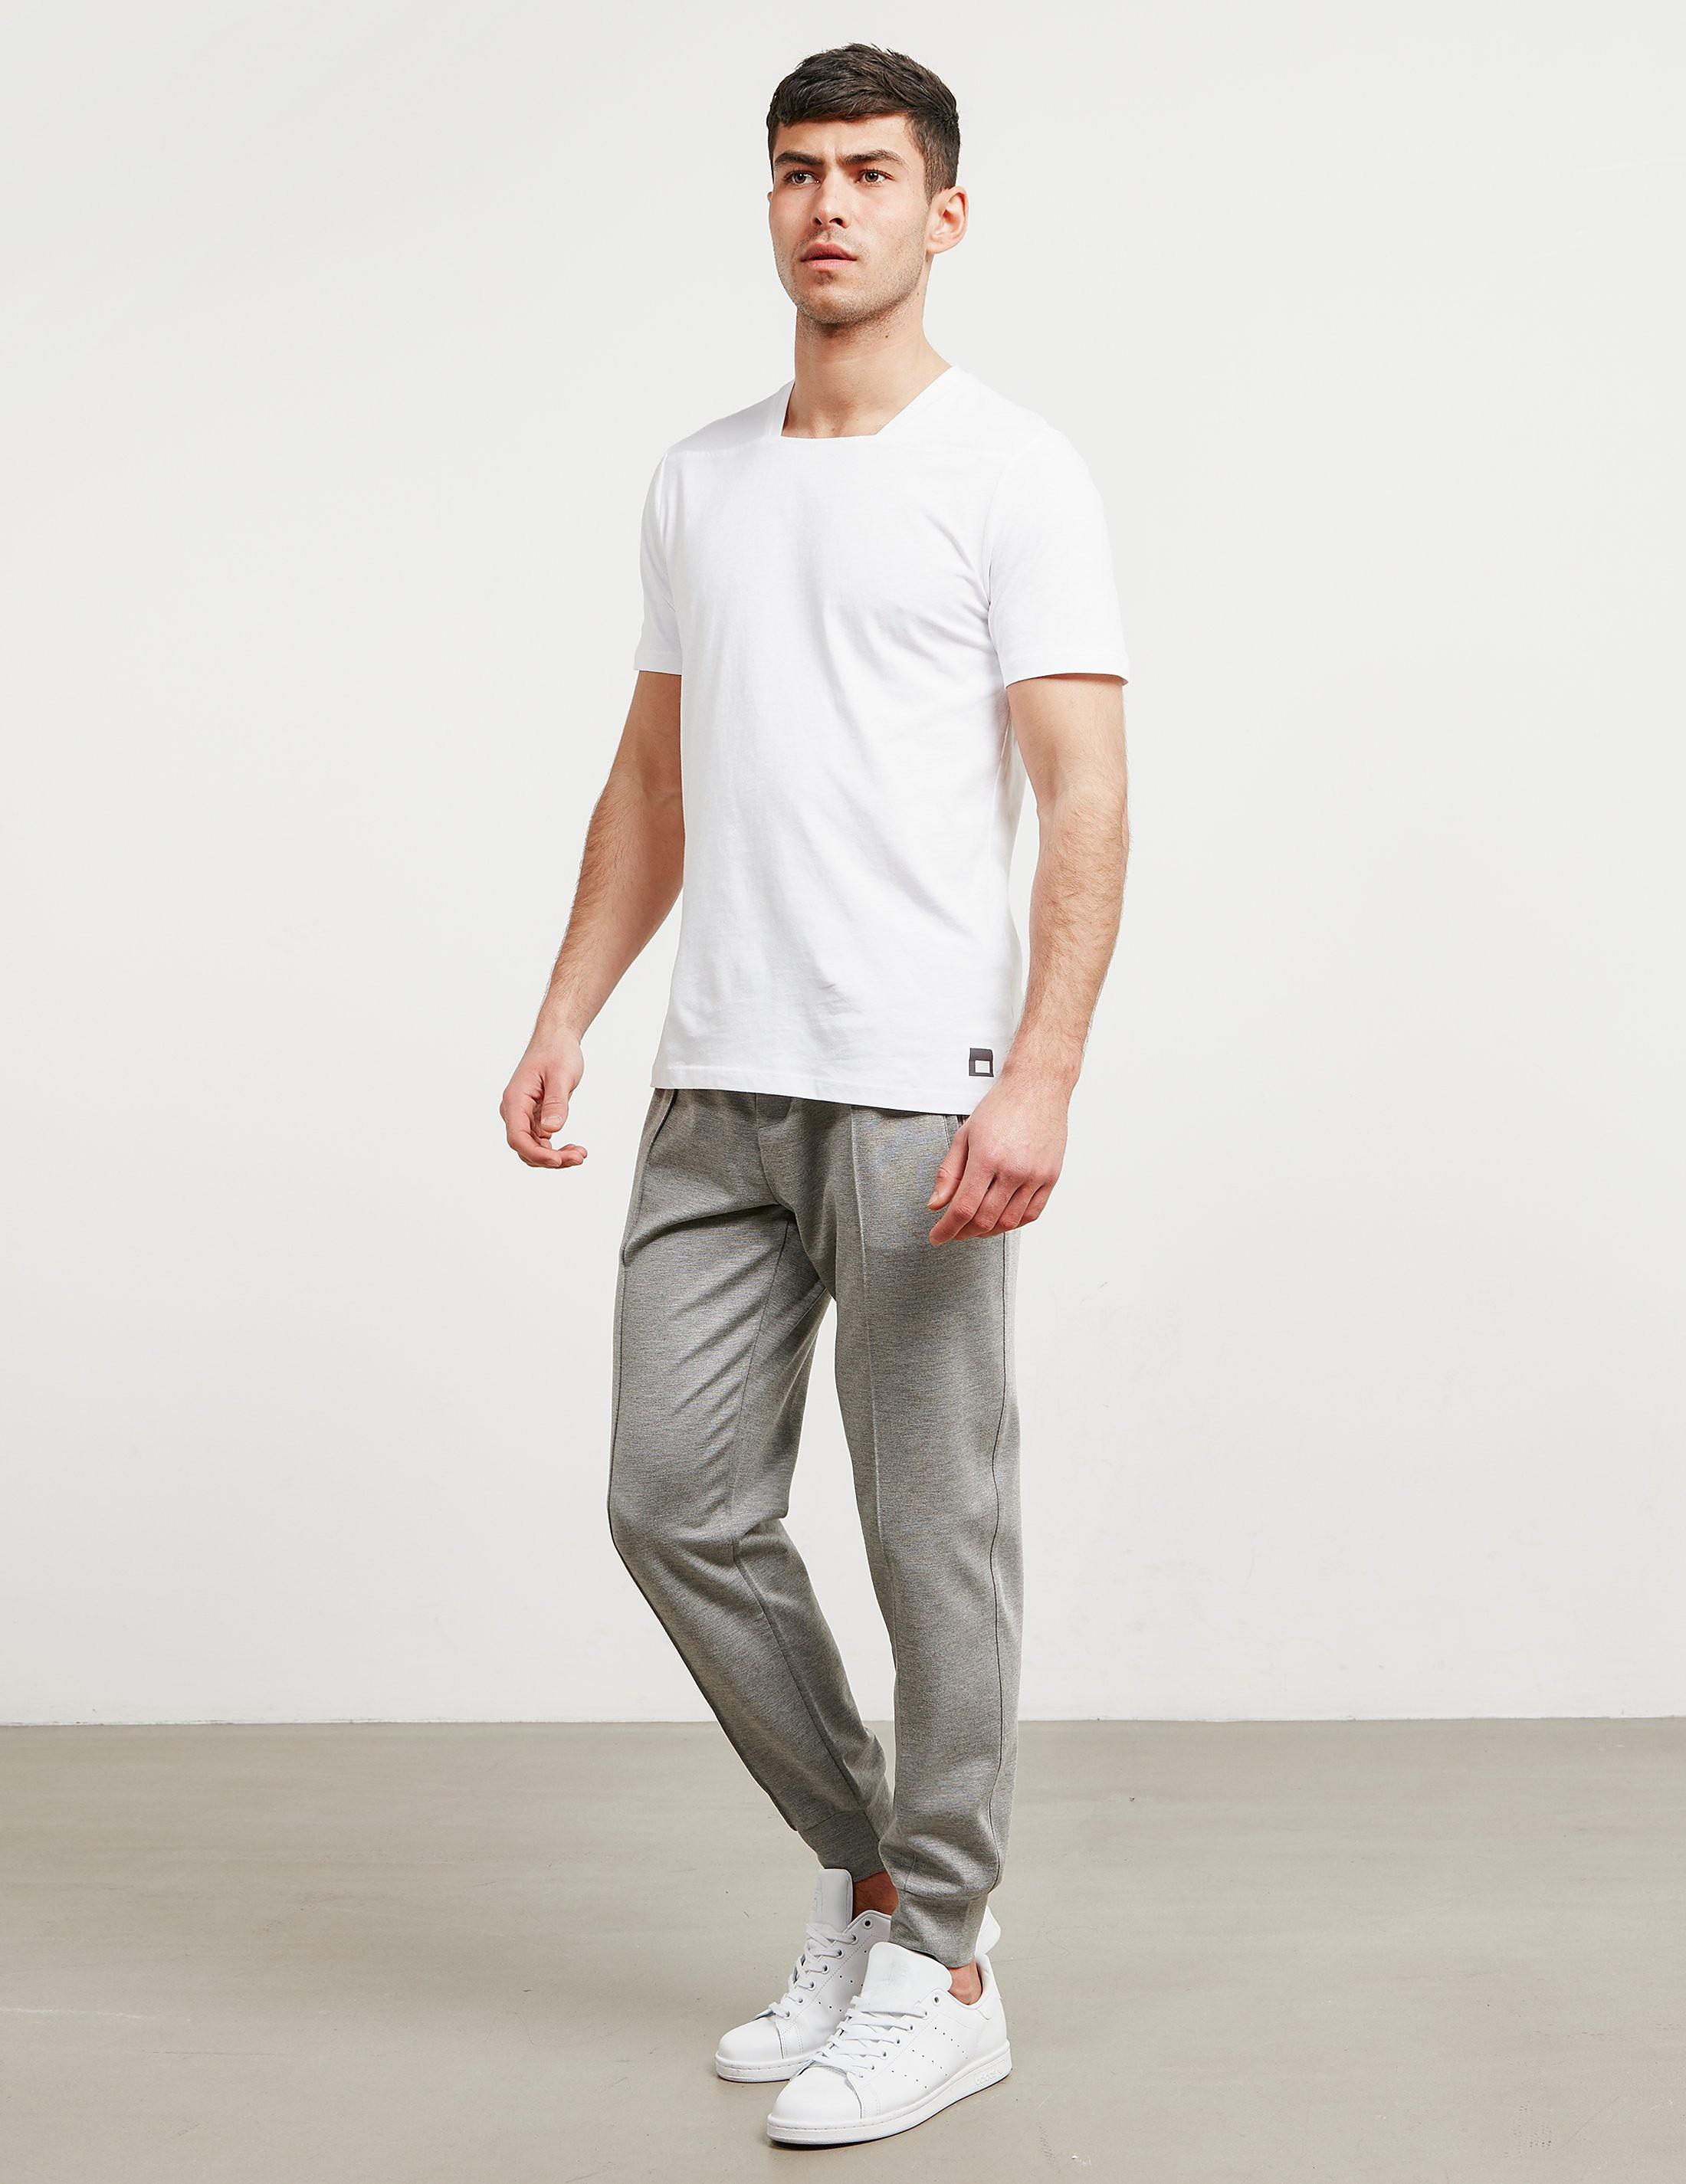 Pal Zileri Square Neck Short Sleeve T-Shirt